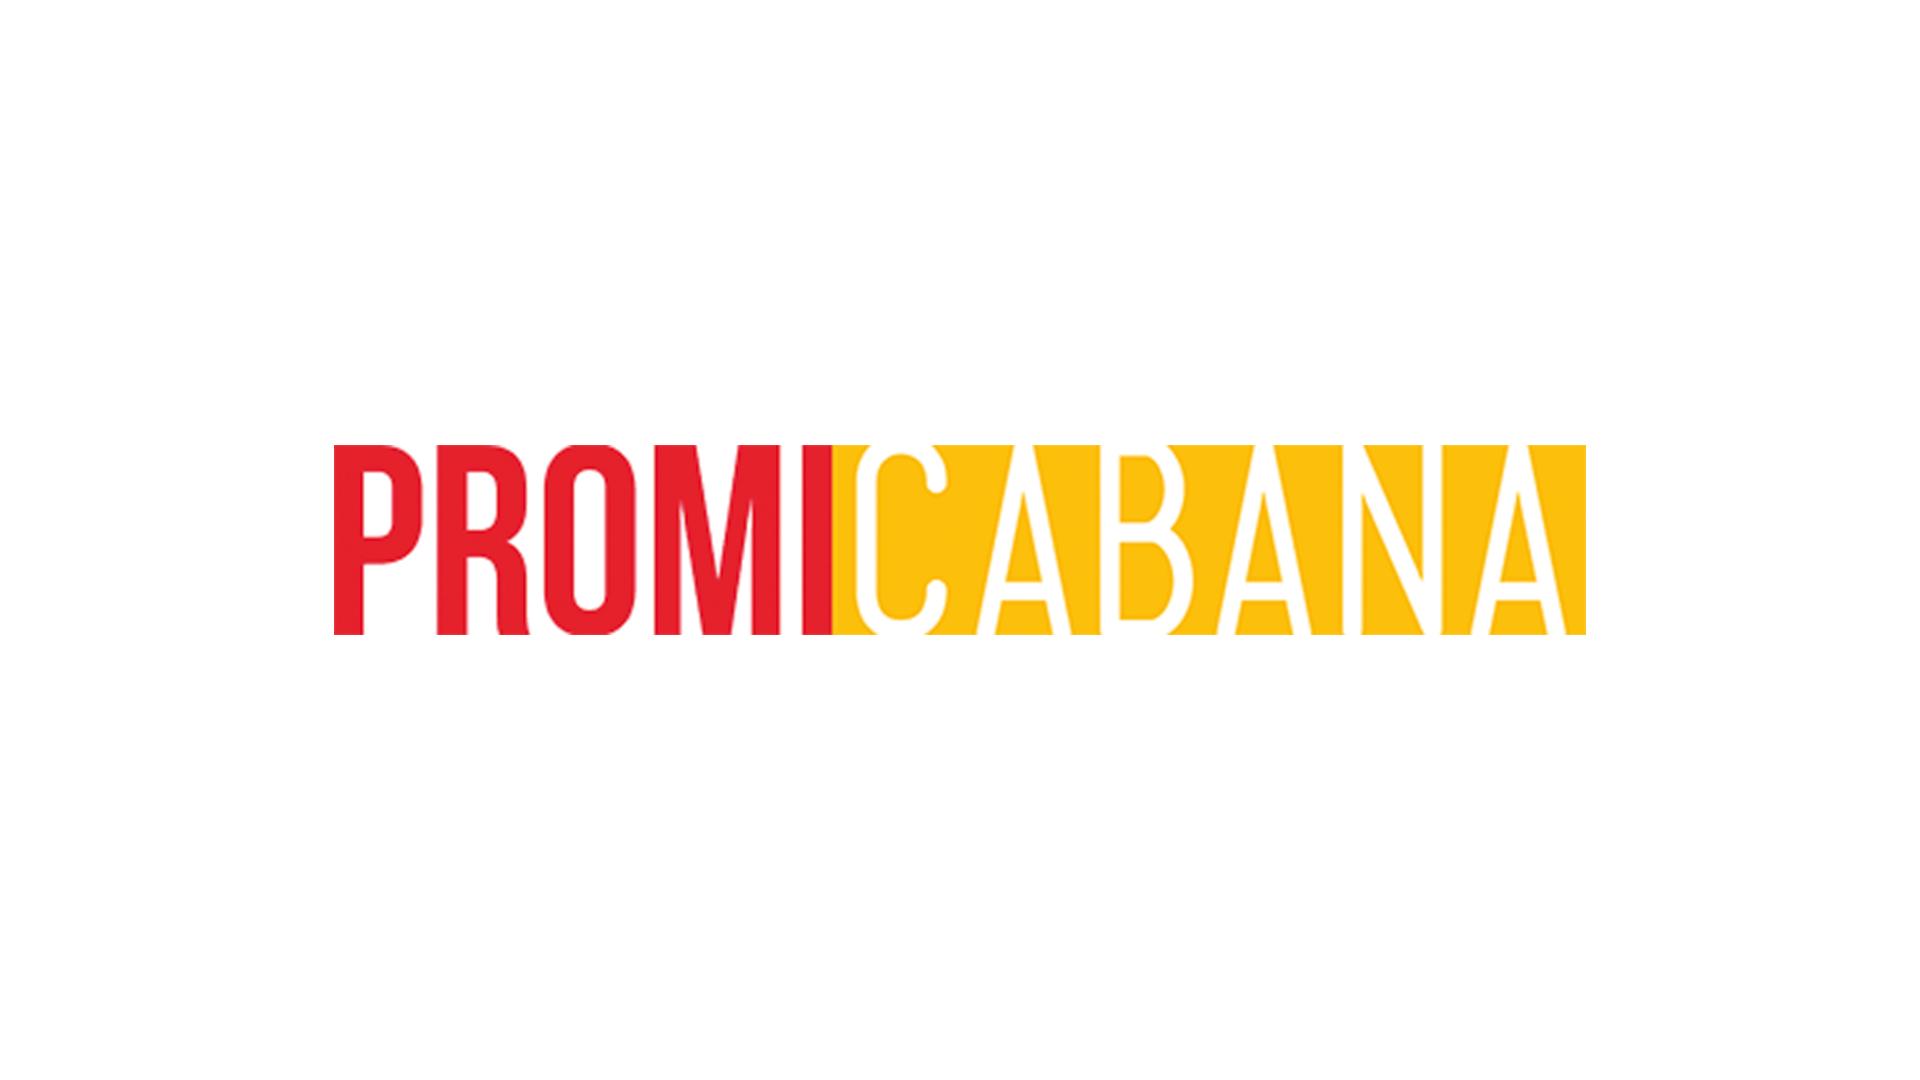 James-Franco-Stephen-Colbert